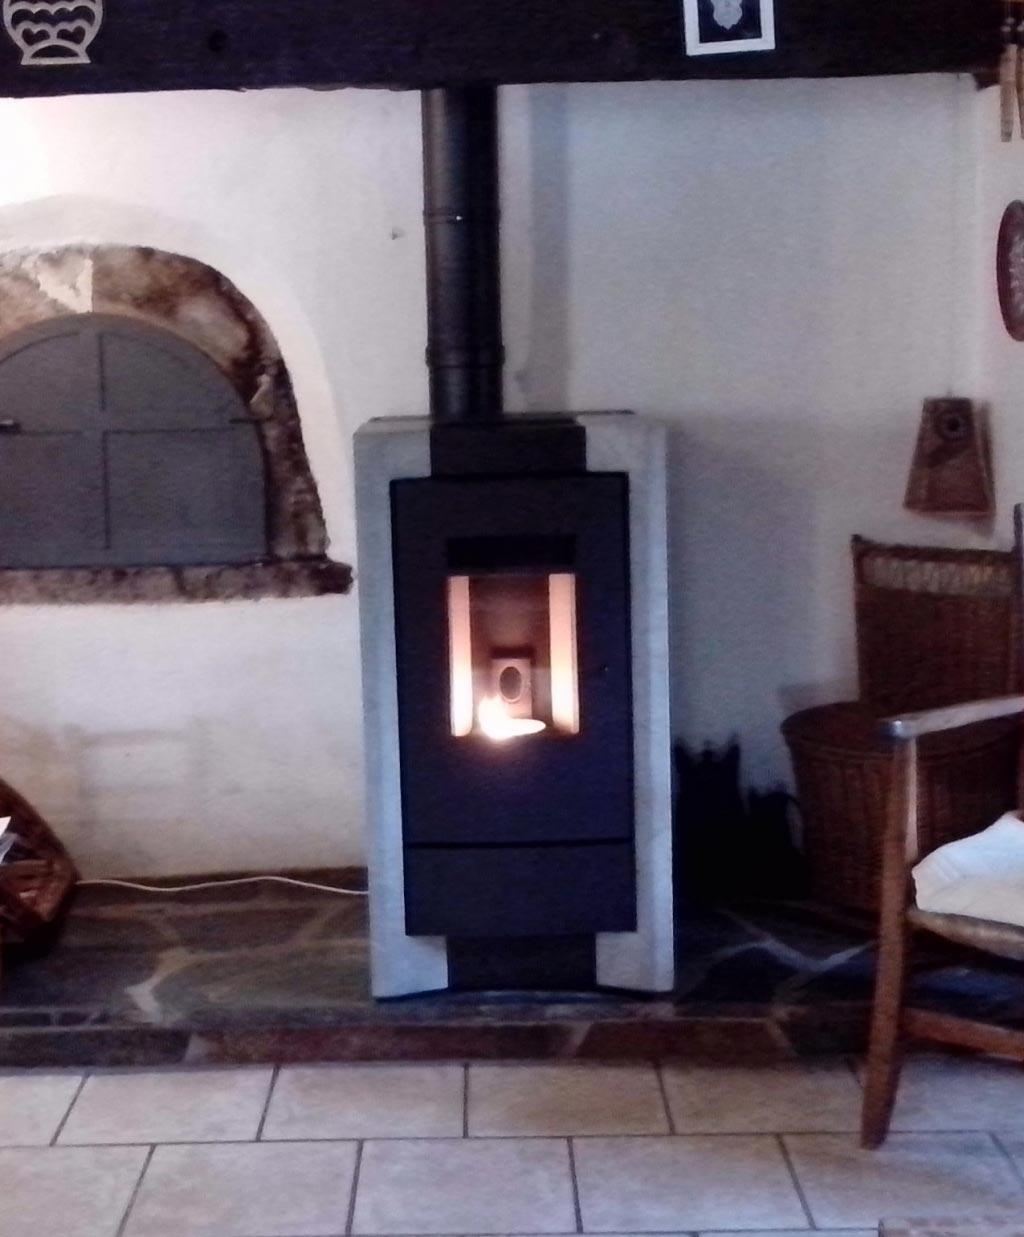 Poêle à granulés RIKA à Golinhac, AVEYRON (12)-Aveyron (12)